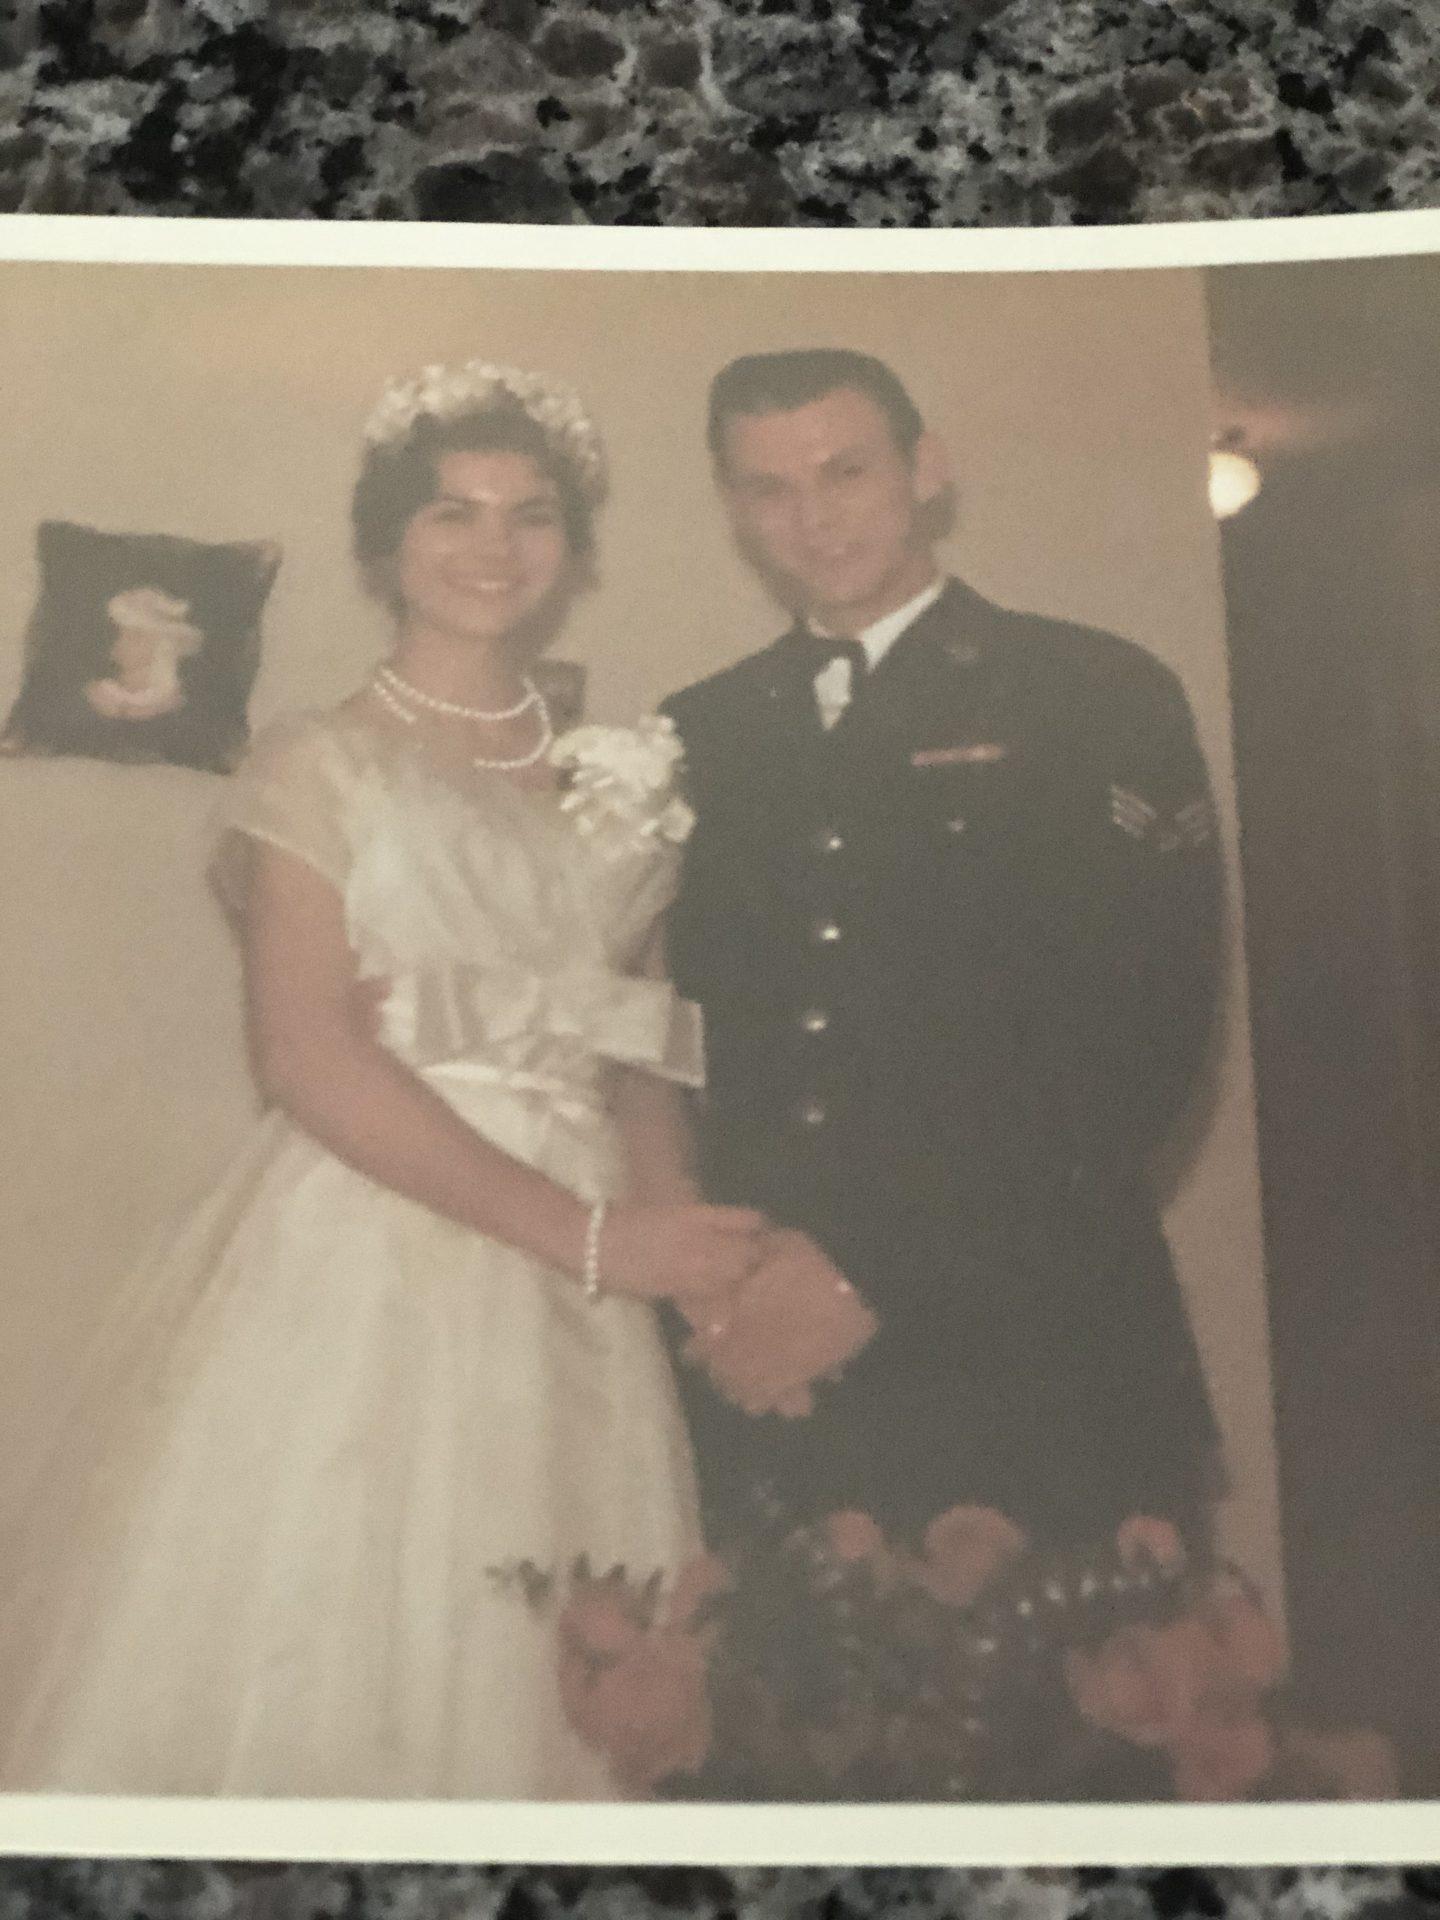 Dads wedding photo